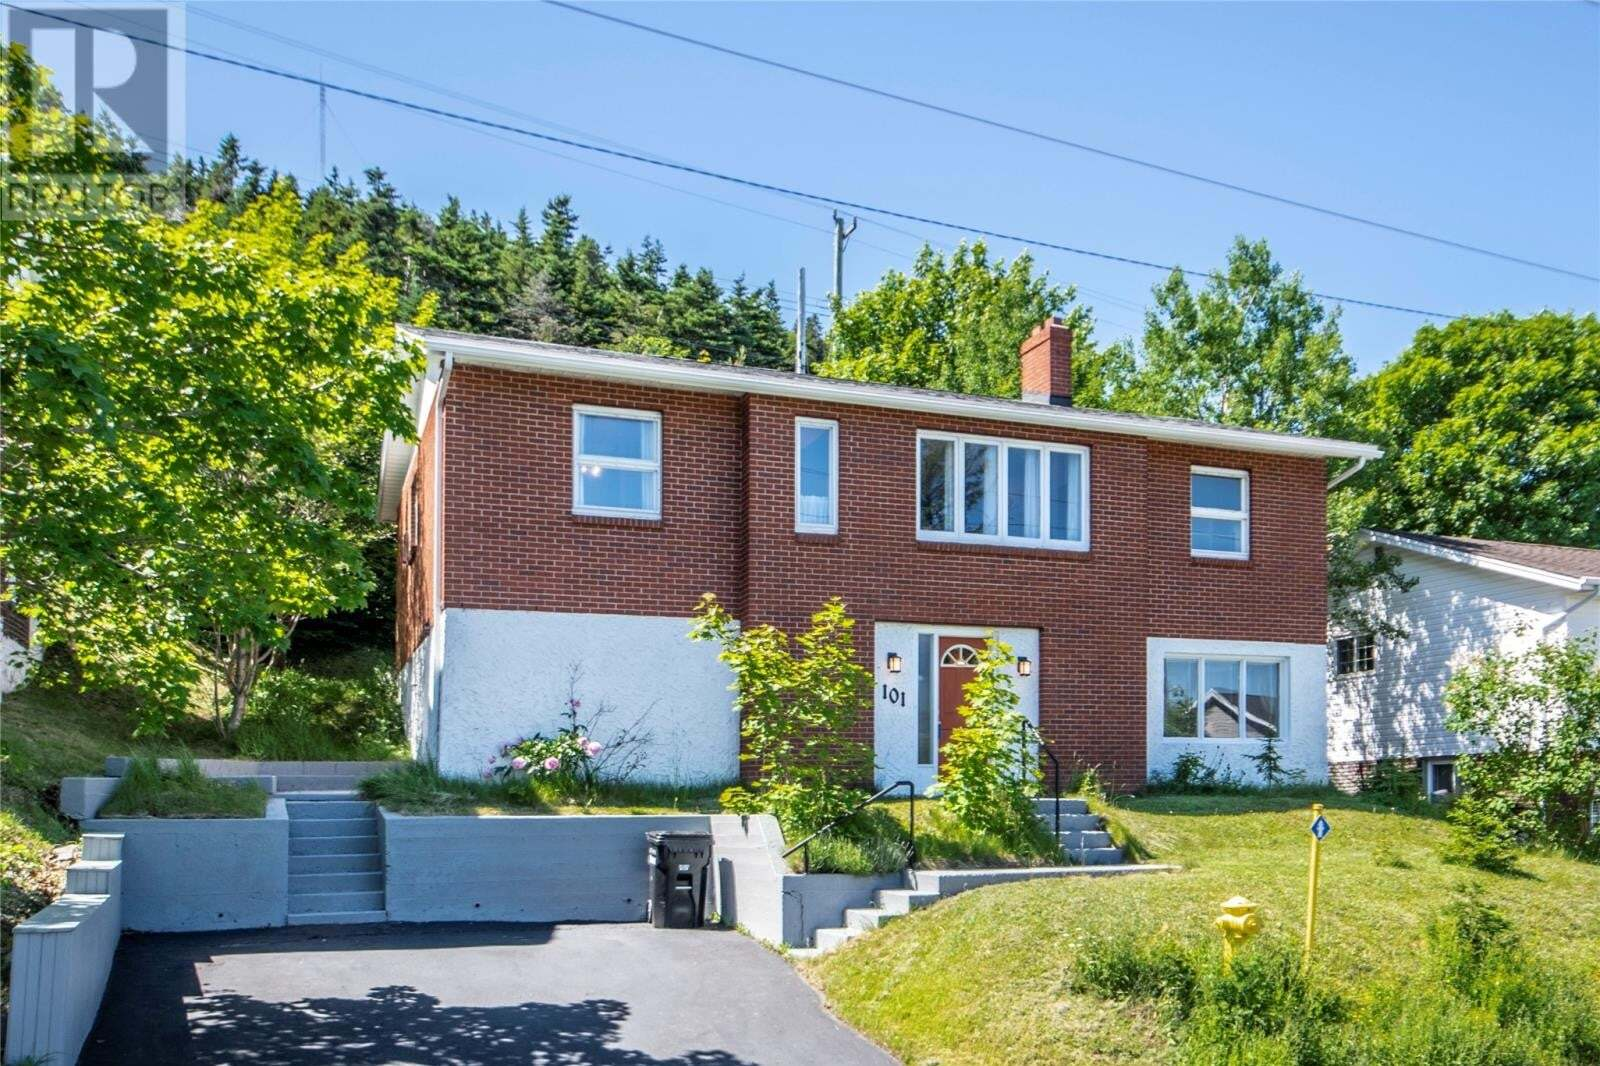 House for sale at 101 Larkhall St St. John's Newfoundland - MLS: 1217330